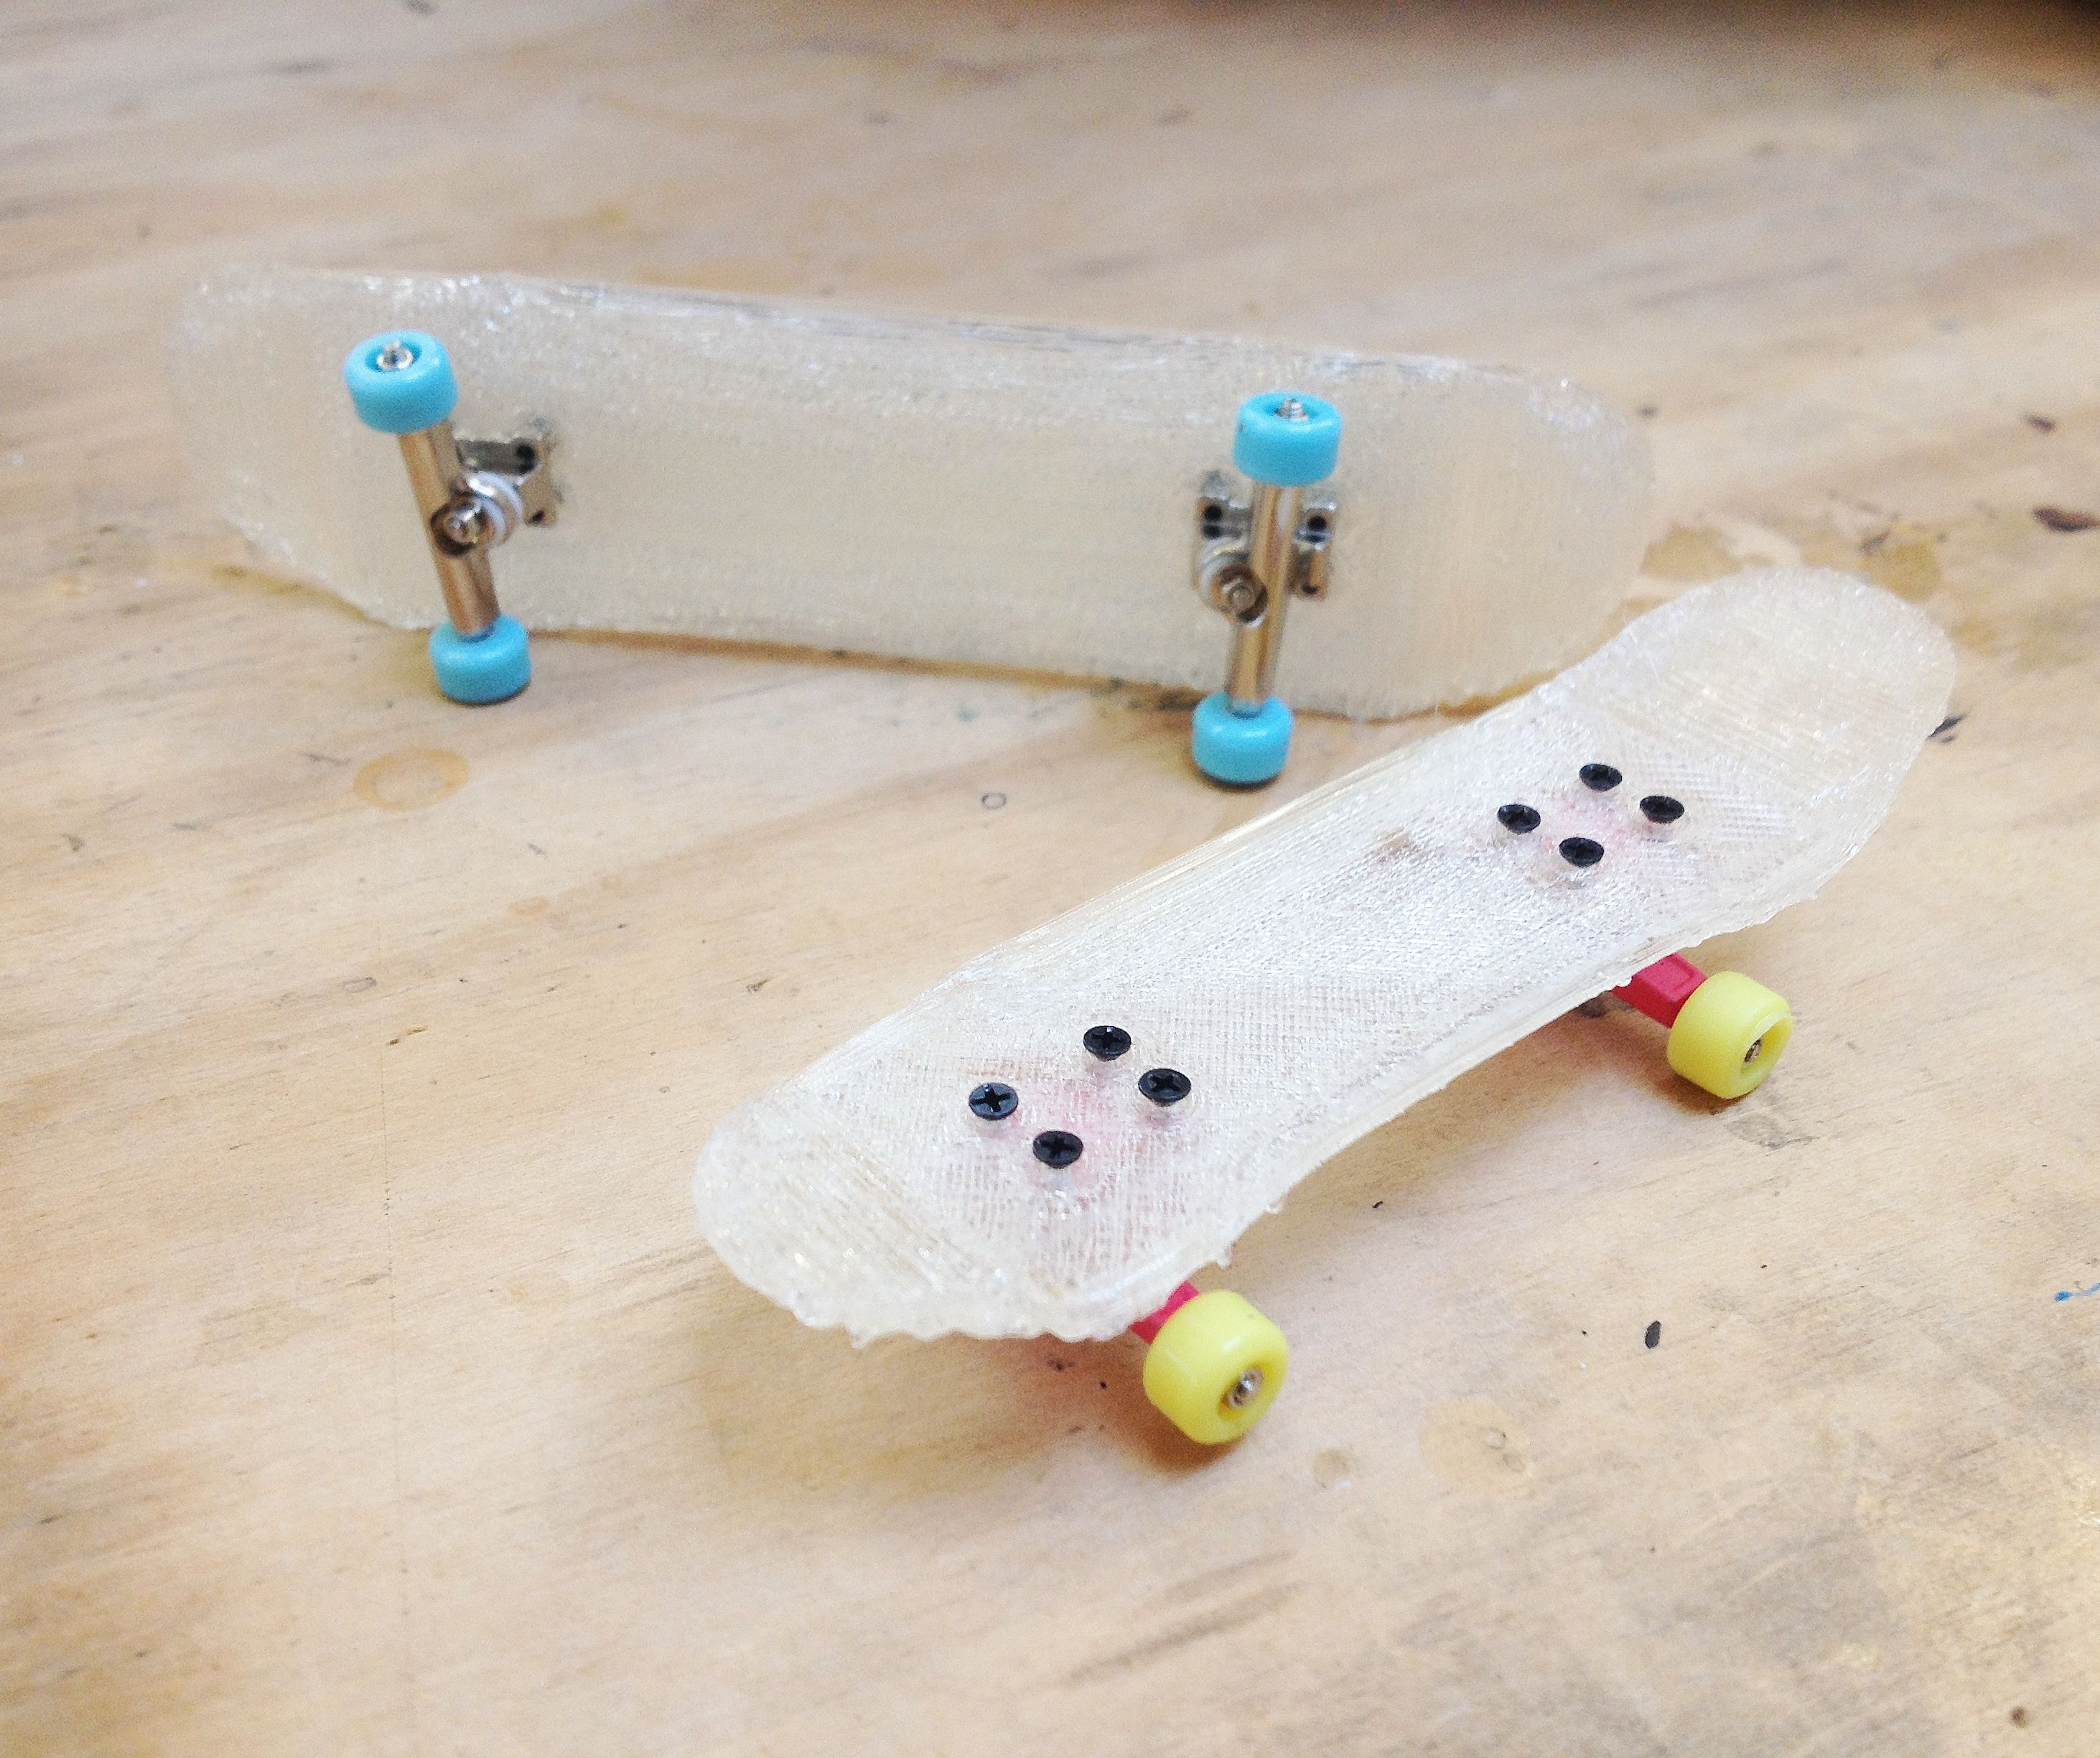 Custom 3D Printed Fingerboards!